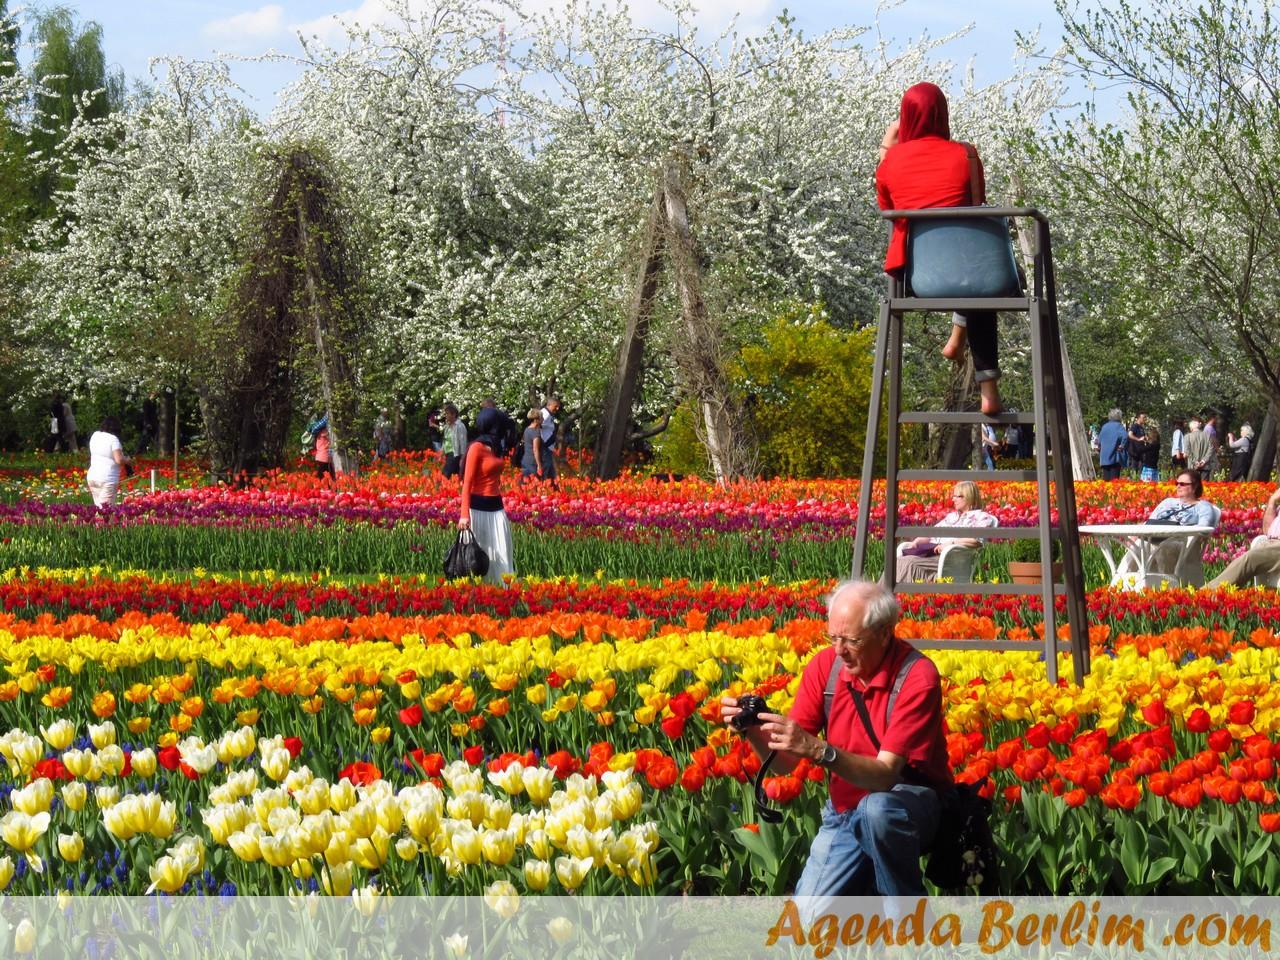 Festival de tulipas no Britzer Garten - ©Pacelli Luckwu